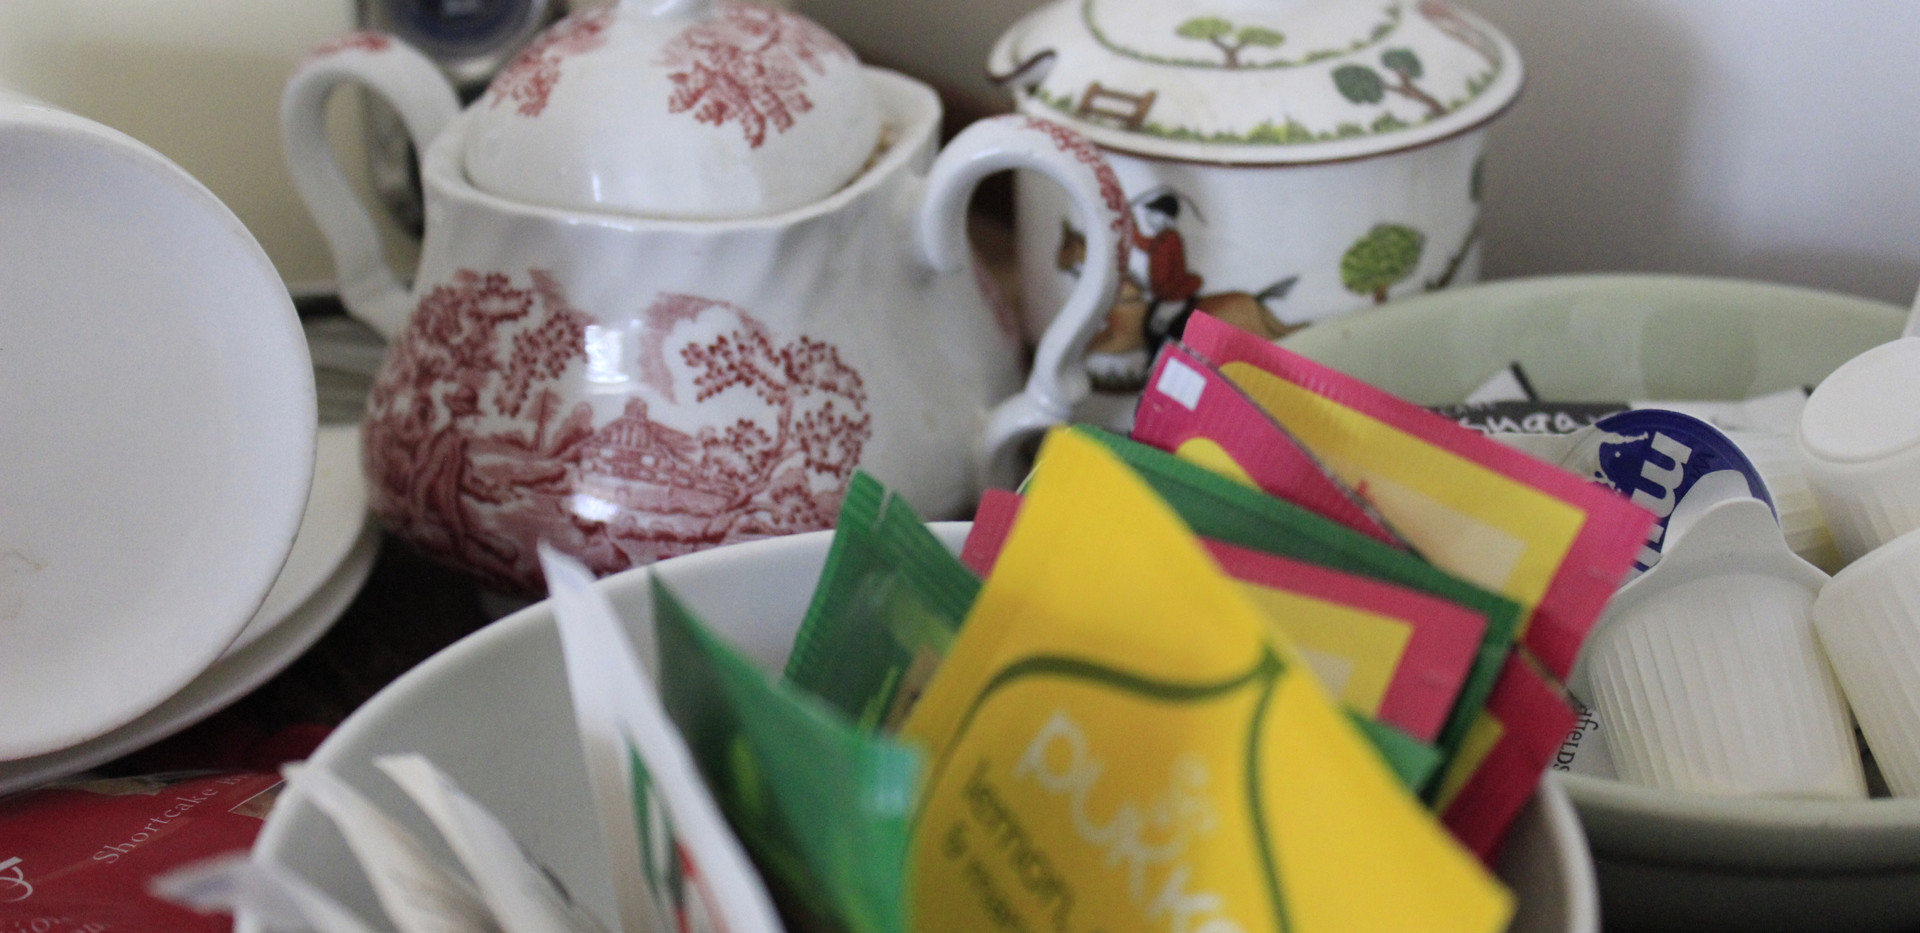 Tea and coffee facilities.JPG